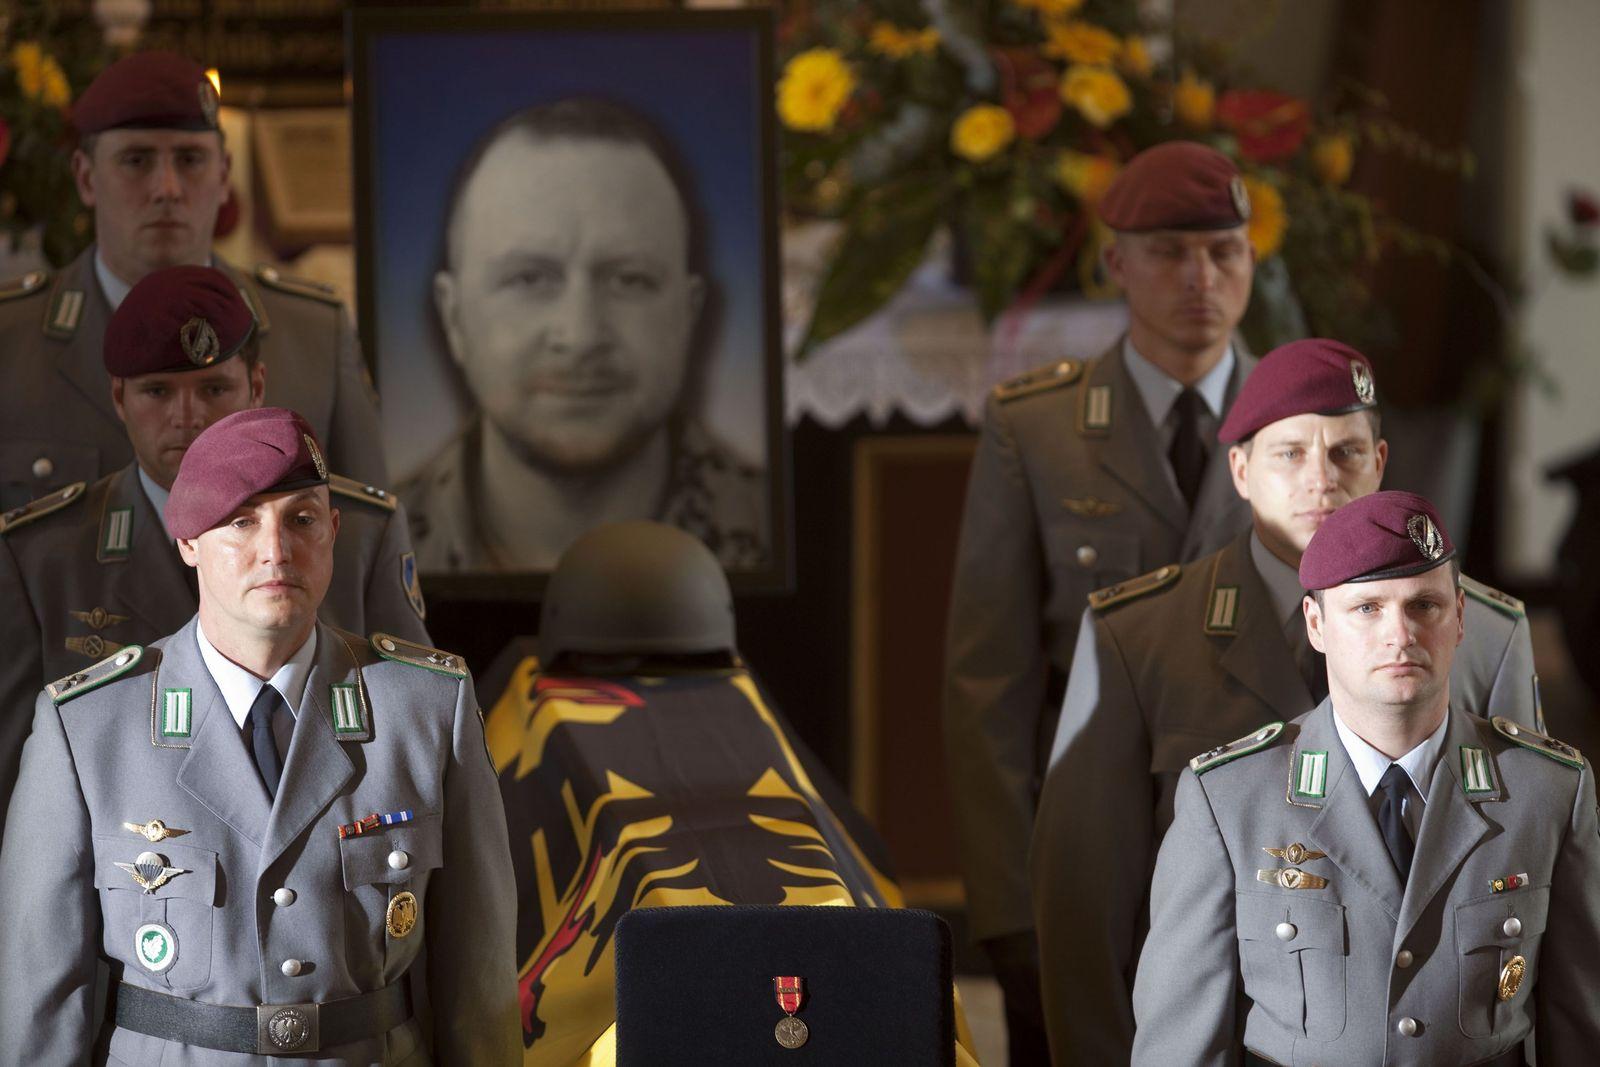 Trauerfeier Nils Bruns Soldat Afghanistan Bundeswehr